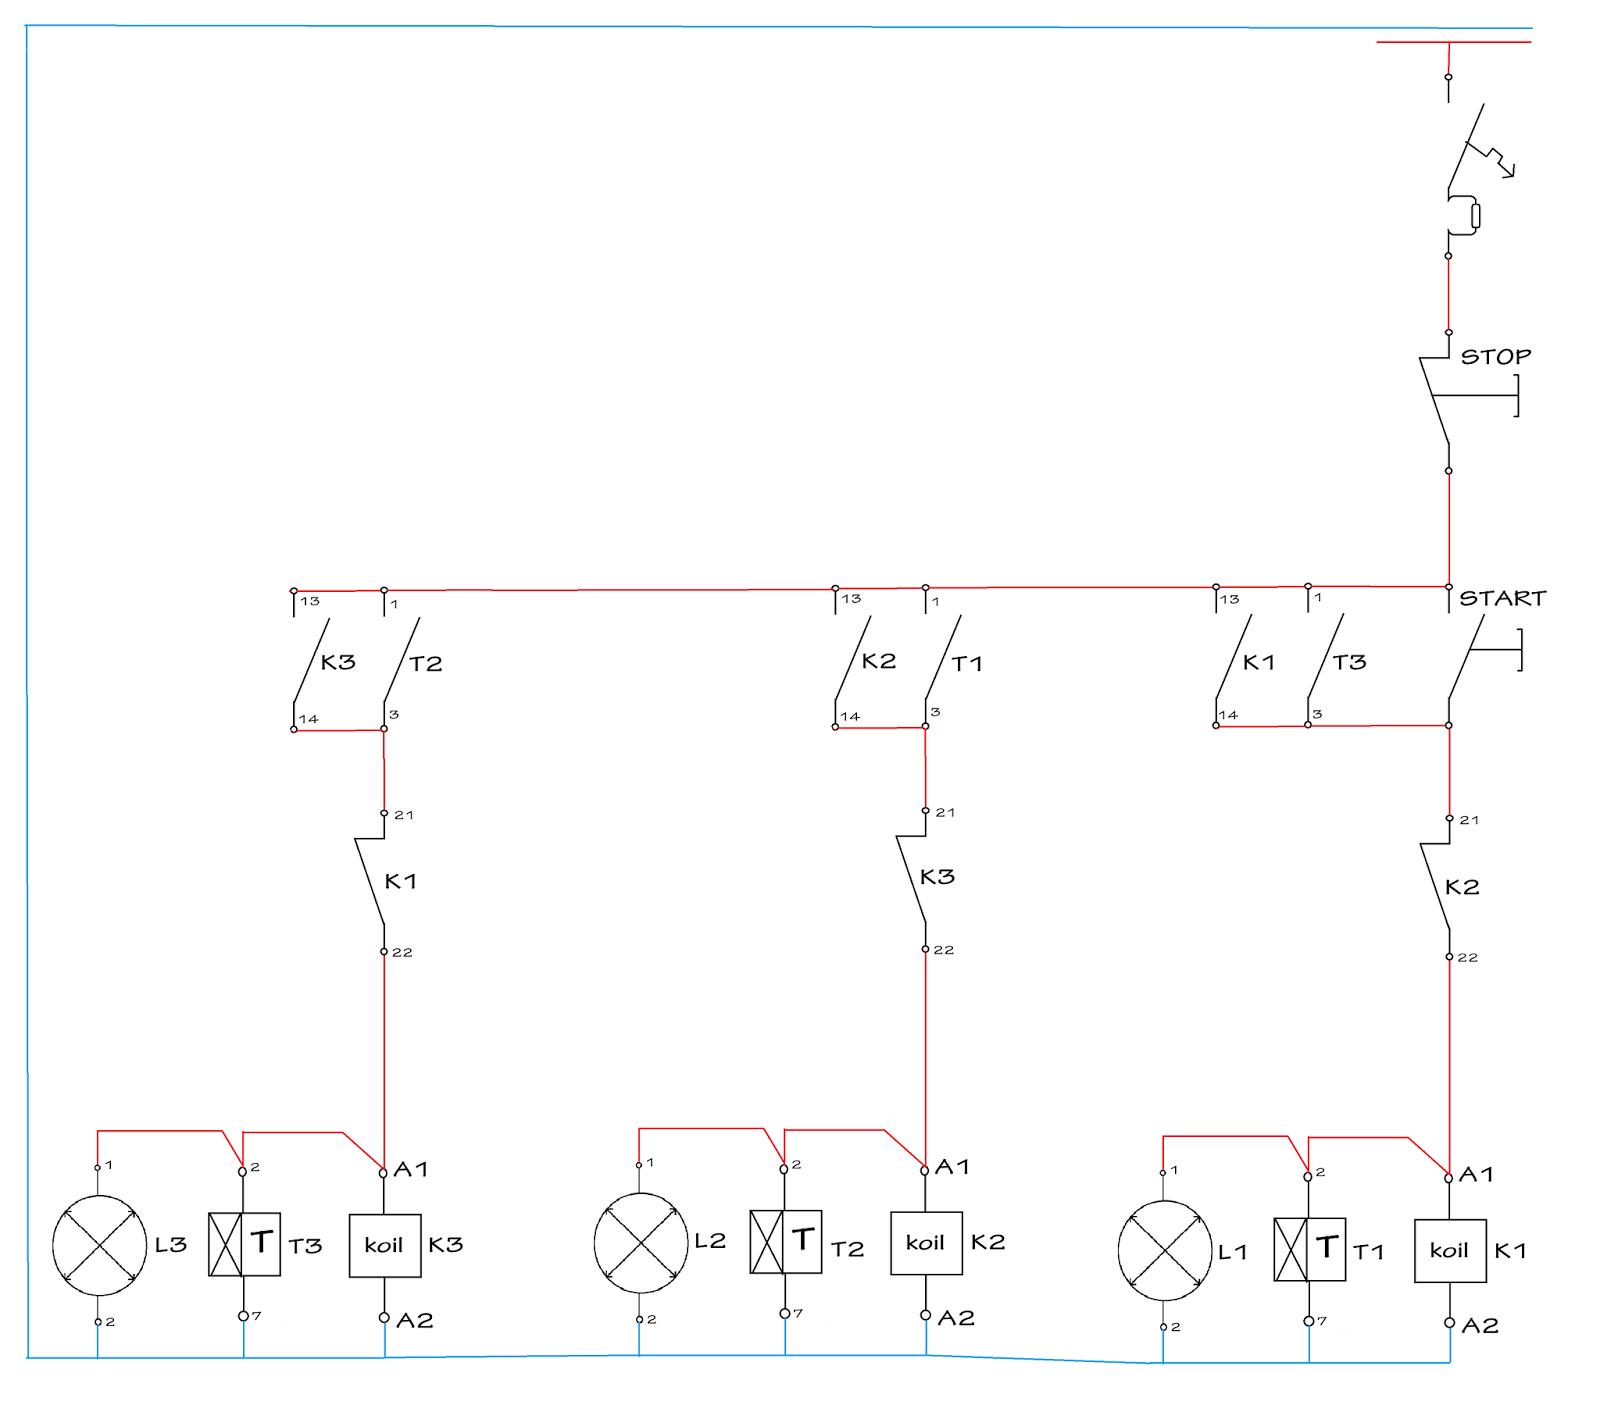 Rangkaian lampu lalu lintas menggunakan tdr dan kontaktor magnet rangkaian lampu lalu lintas menggunakan tdr dan kontaktor magnet ccuart Gallery